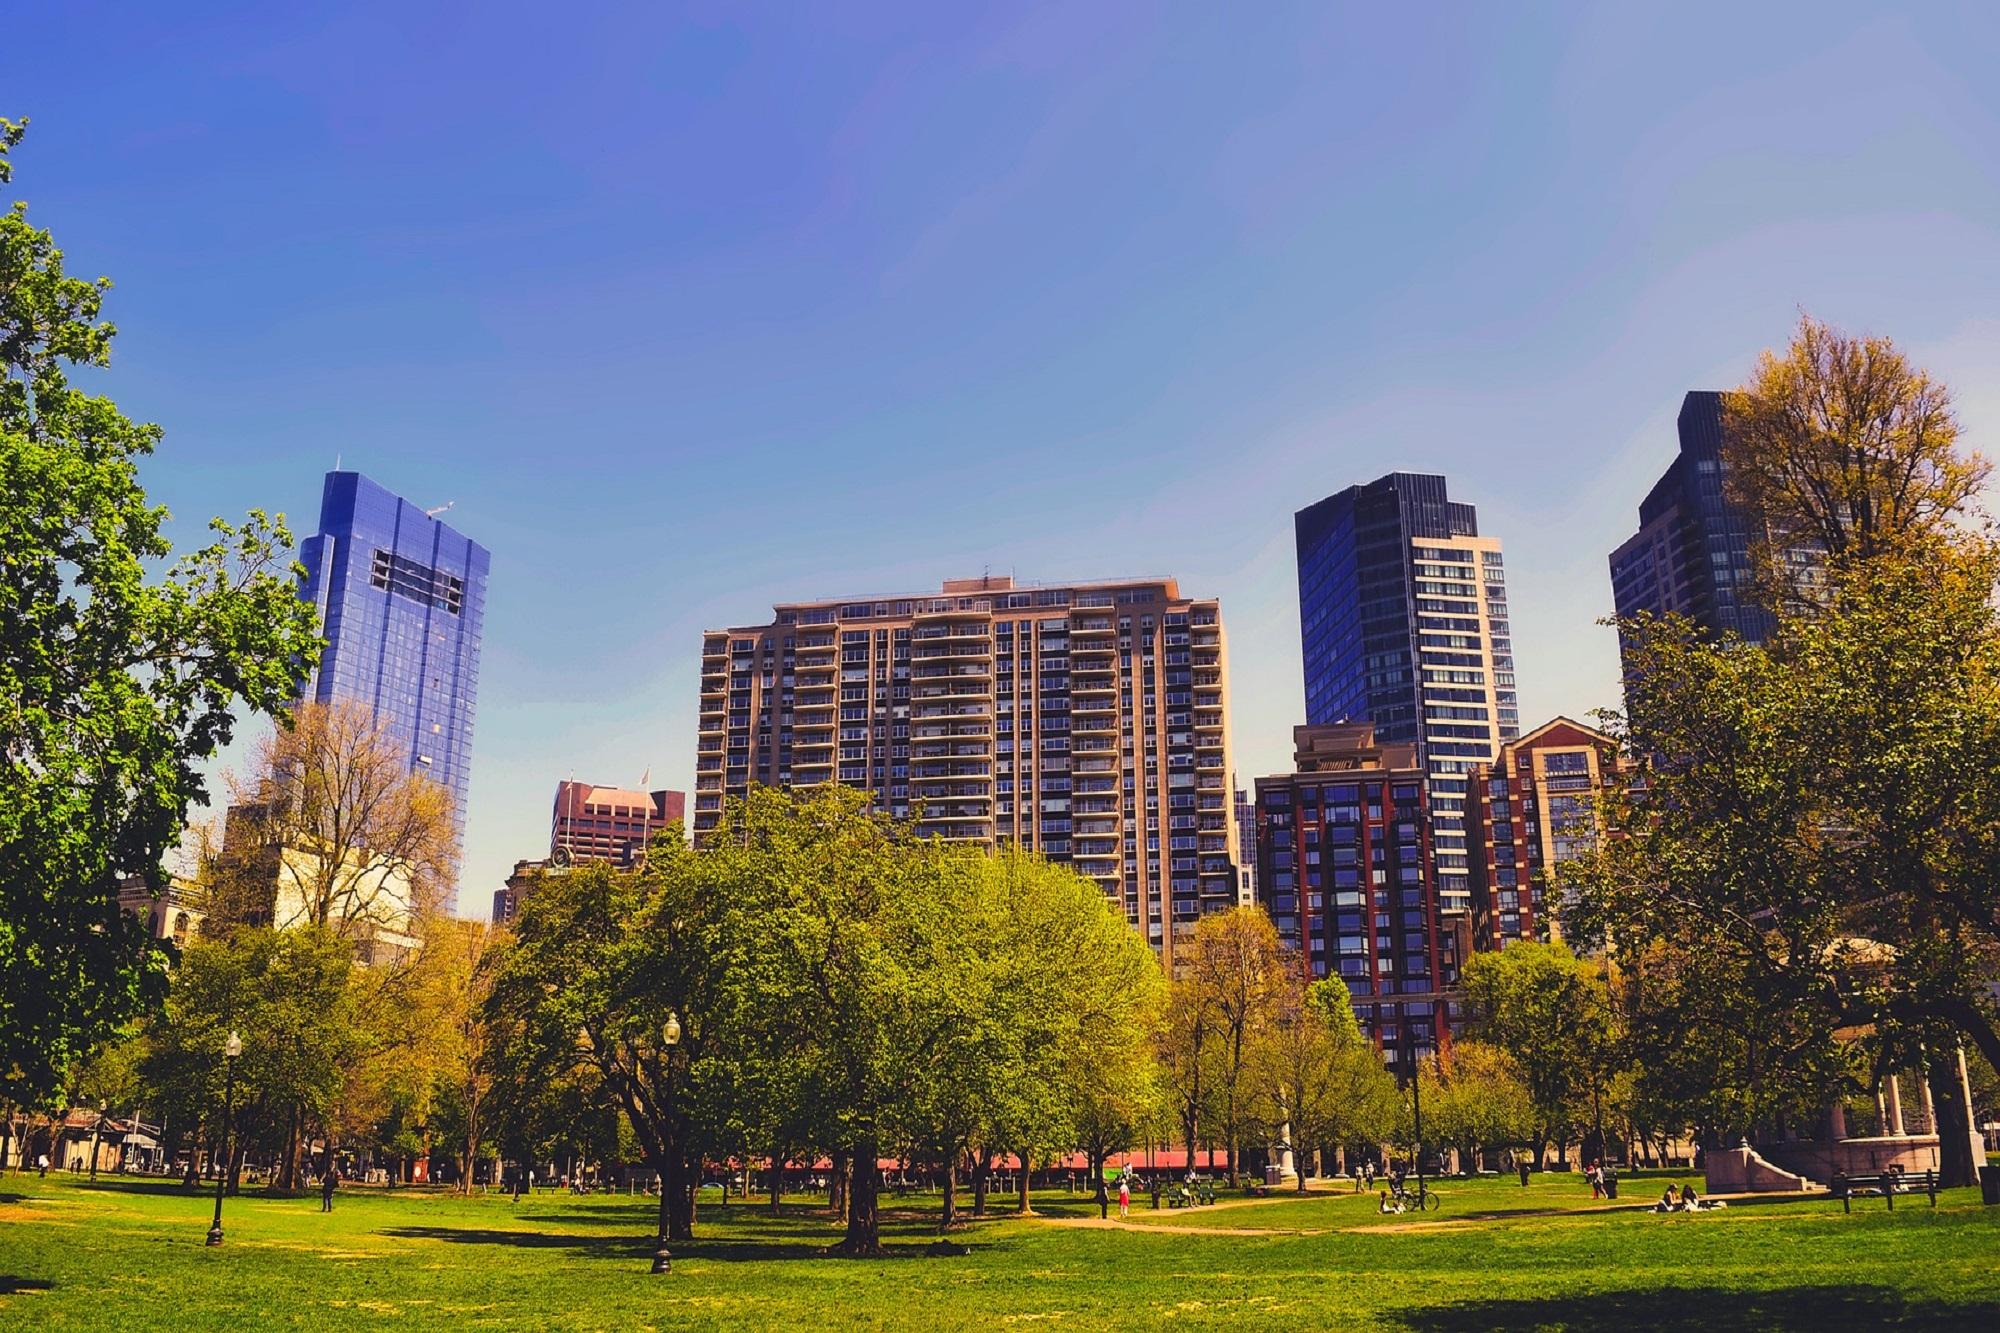 boston-1977008_1920 (1)